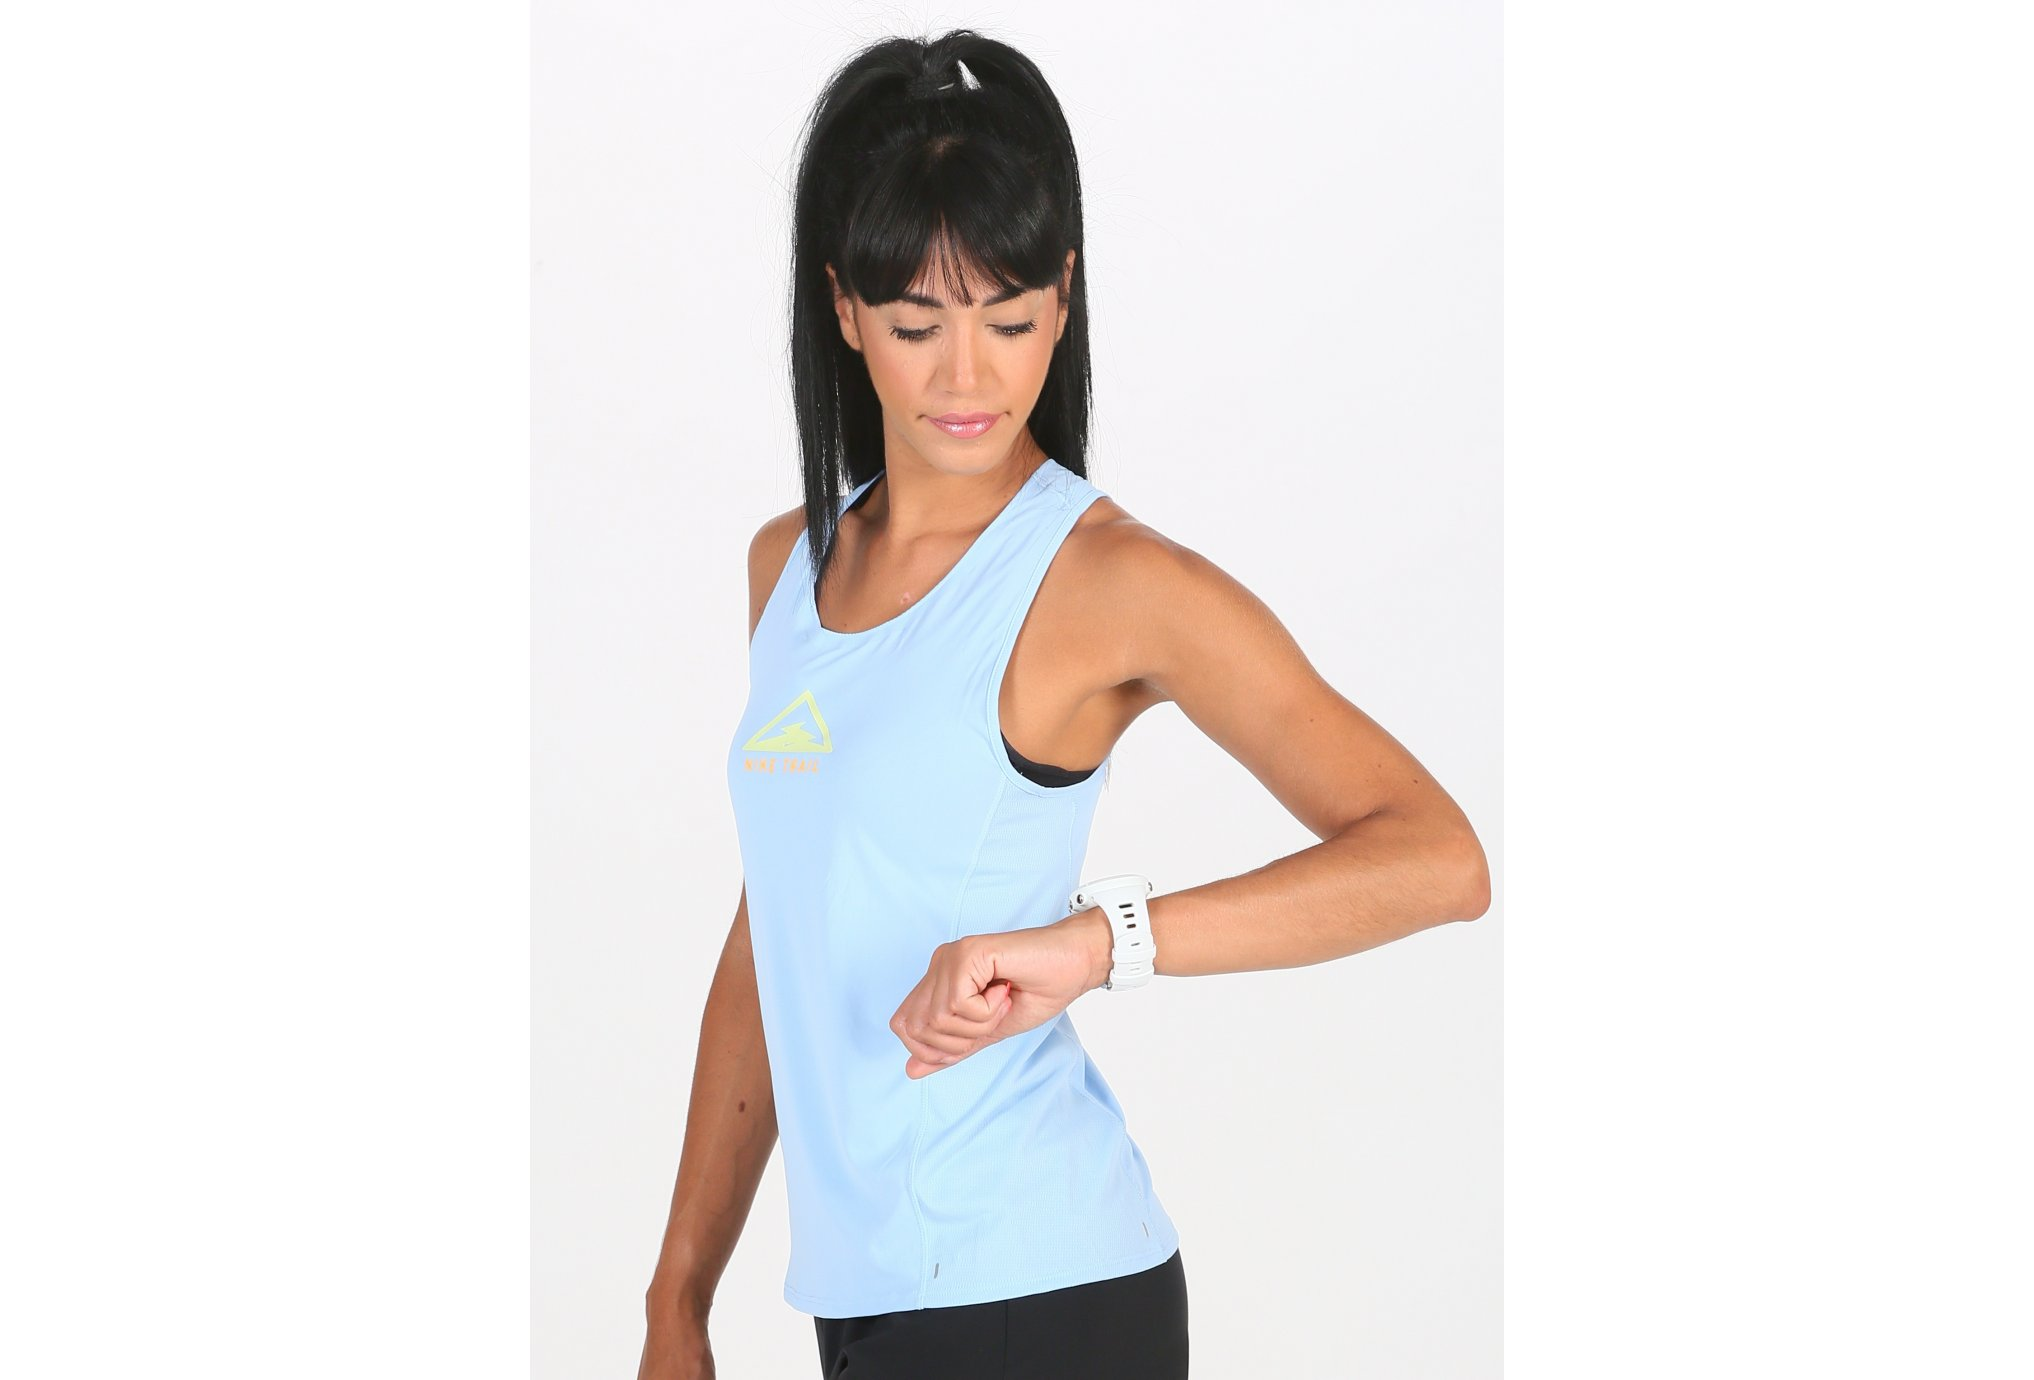 Nike City Sleek Trail W Diététique Vêtements femme